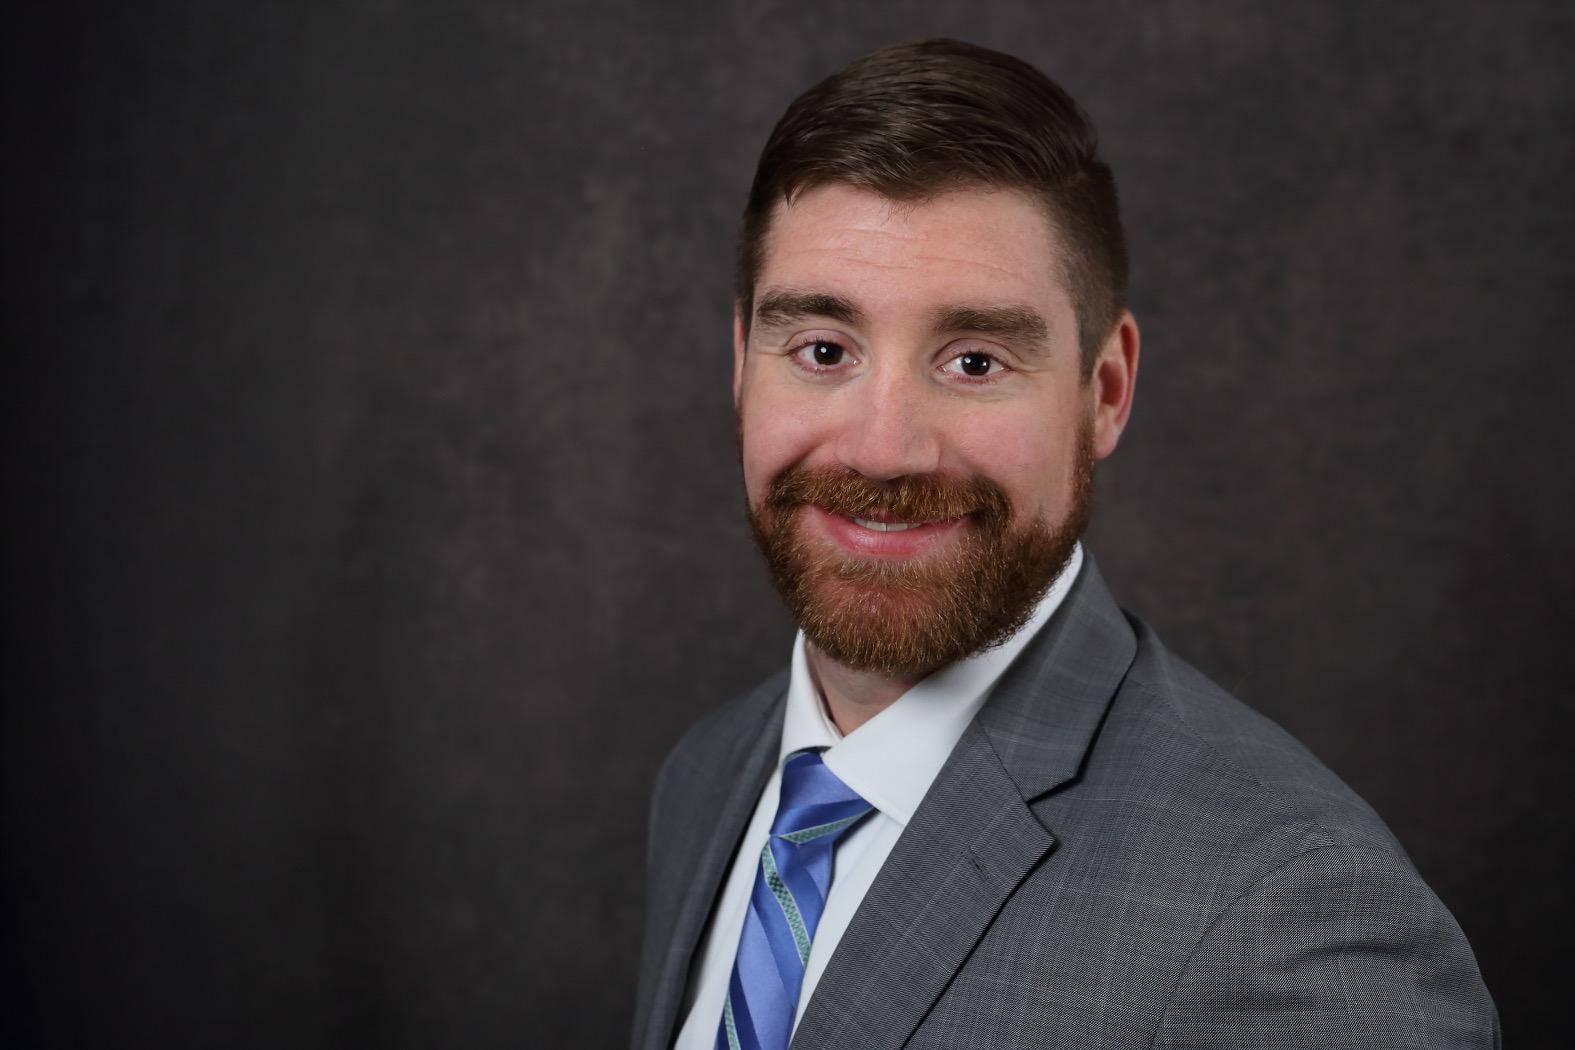 TRAVIS MARTIN MCCLARNEY Your Financial Advisor